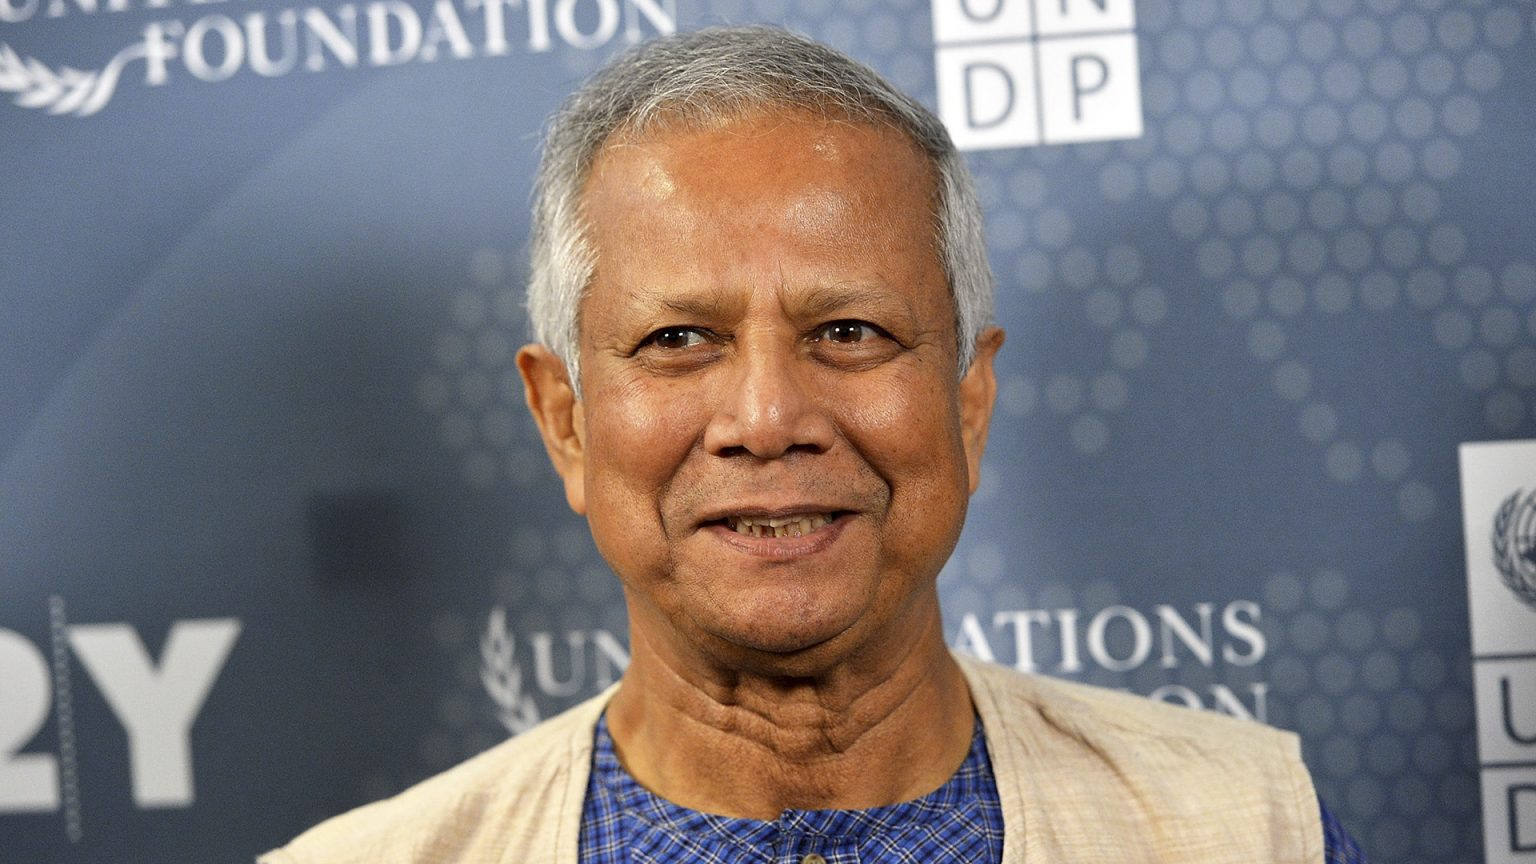 Bangladesh Nobel laureate Muhammad Yunus to get Olympic Laurel| ബംഗ്ലാദേശ് നൊബേൽ സമ്മാന ജേതാവ് മുഹമ്മദ് യൂനുസിനു ഒളിമ്പിക് ലോറൽ ലഭിക്കും_40.1